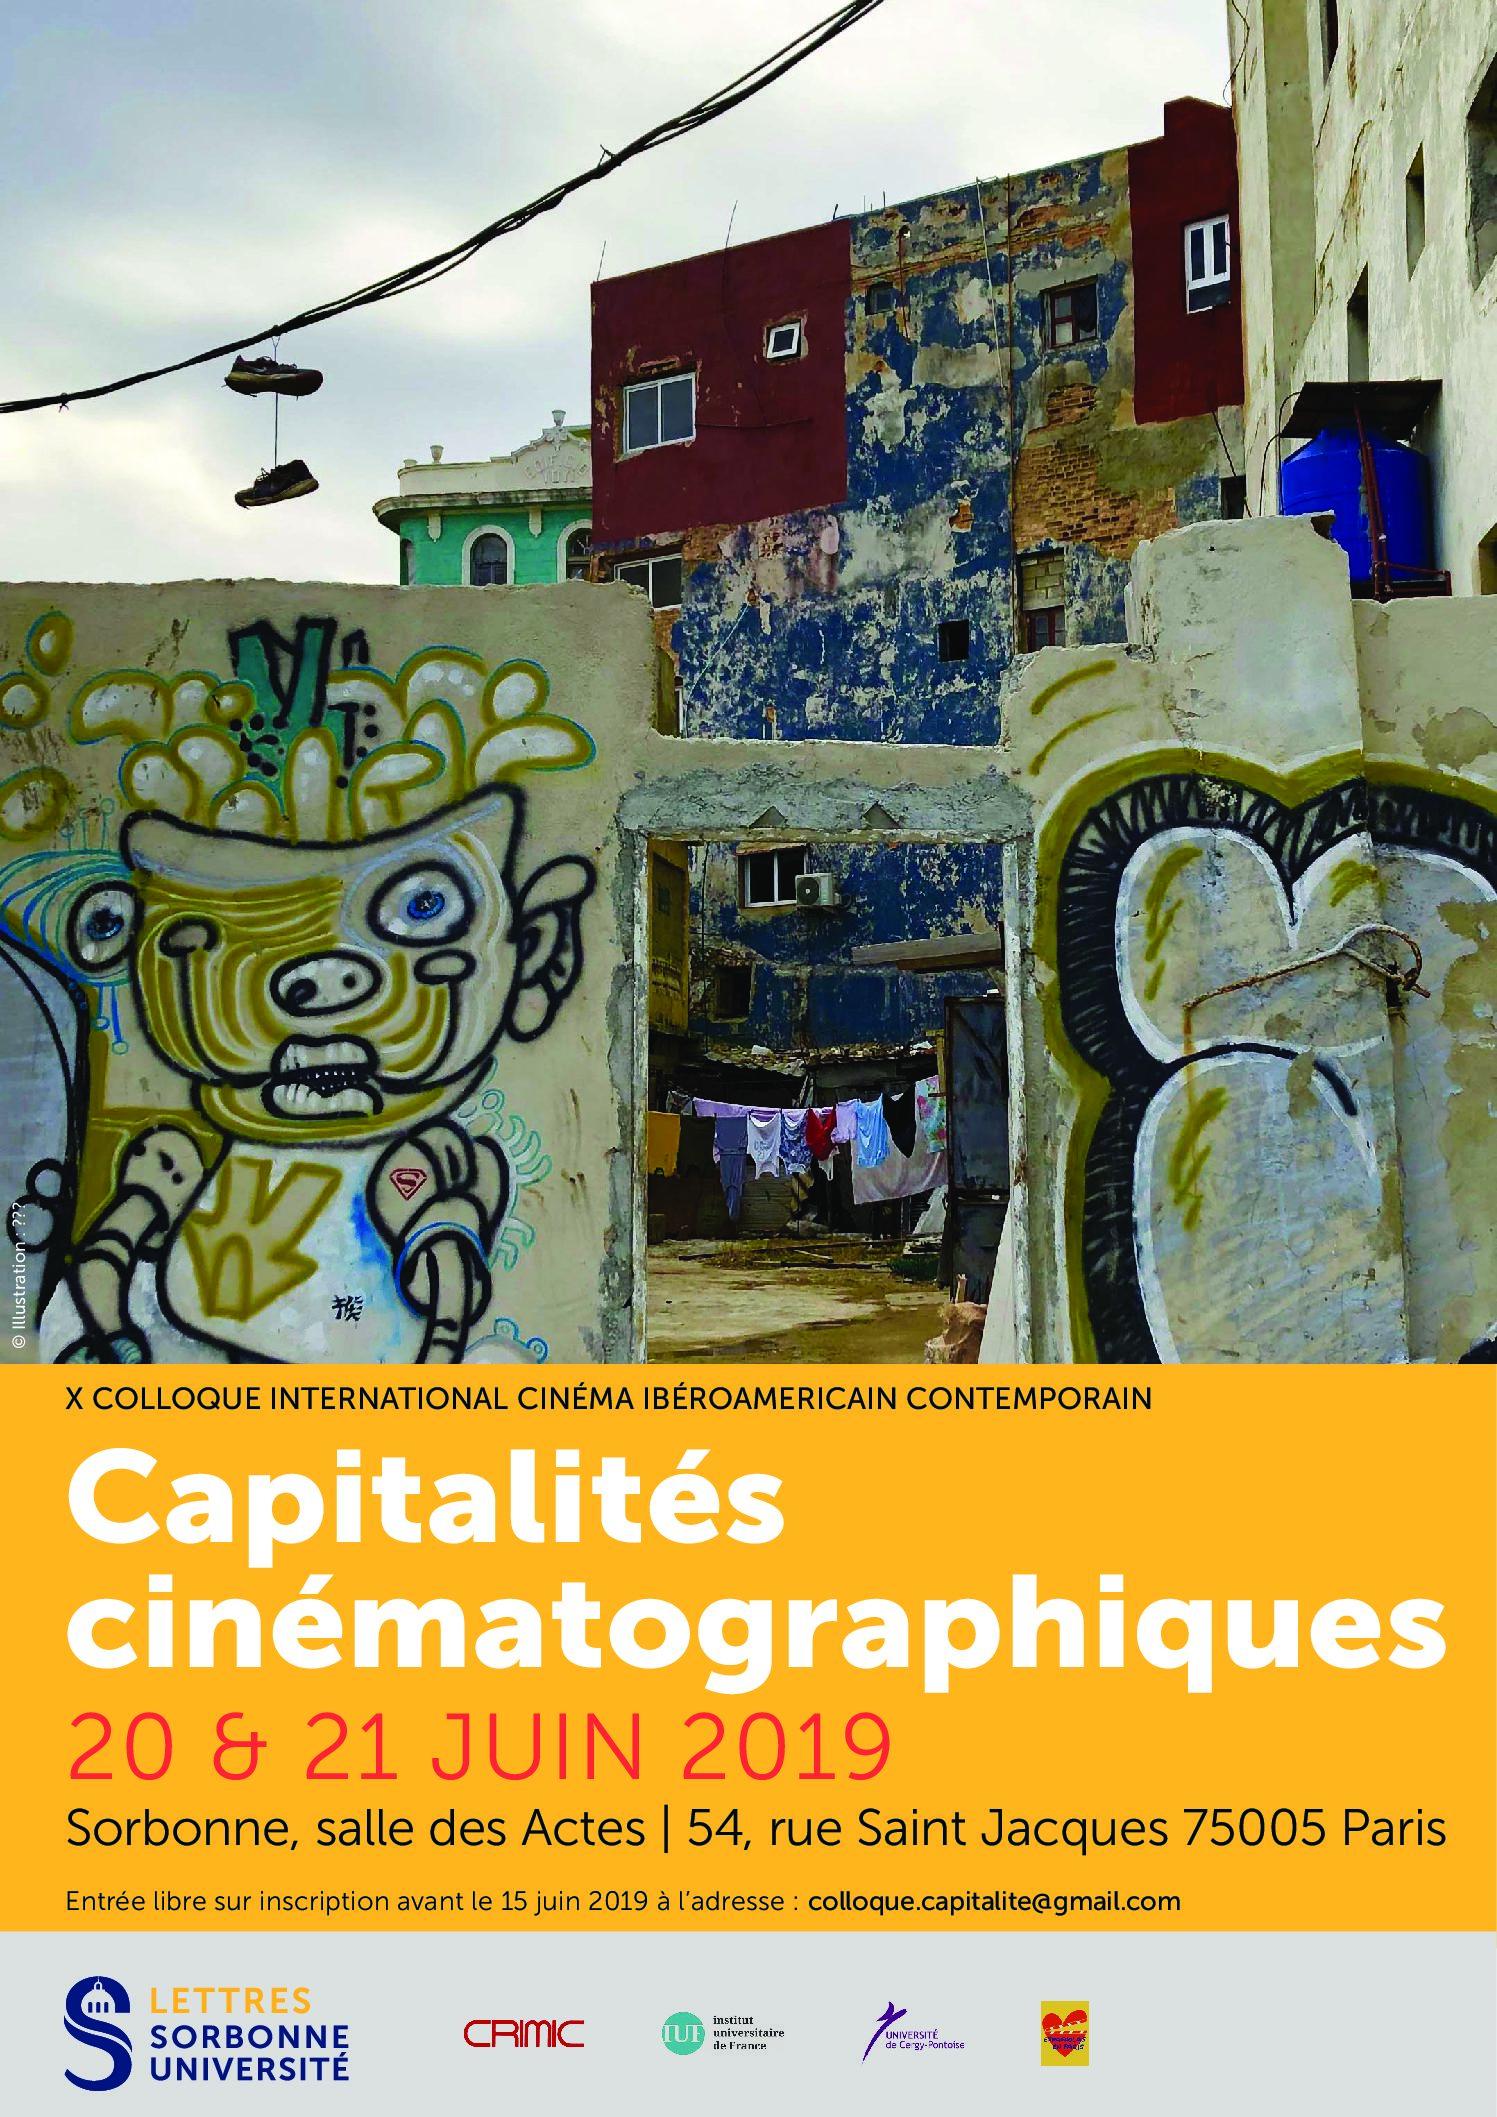 X Coloquio internacional Cine iberoamericano contemporáneo. Capitalidades cinematográficas